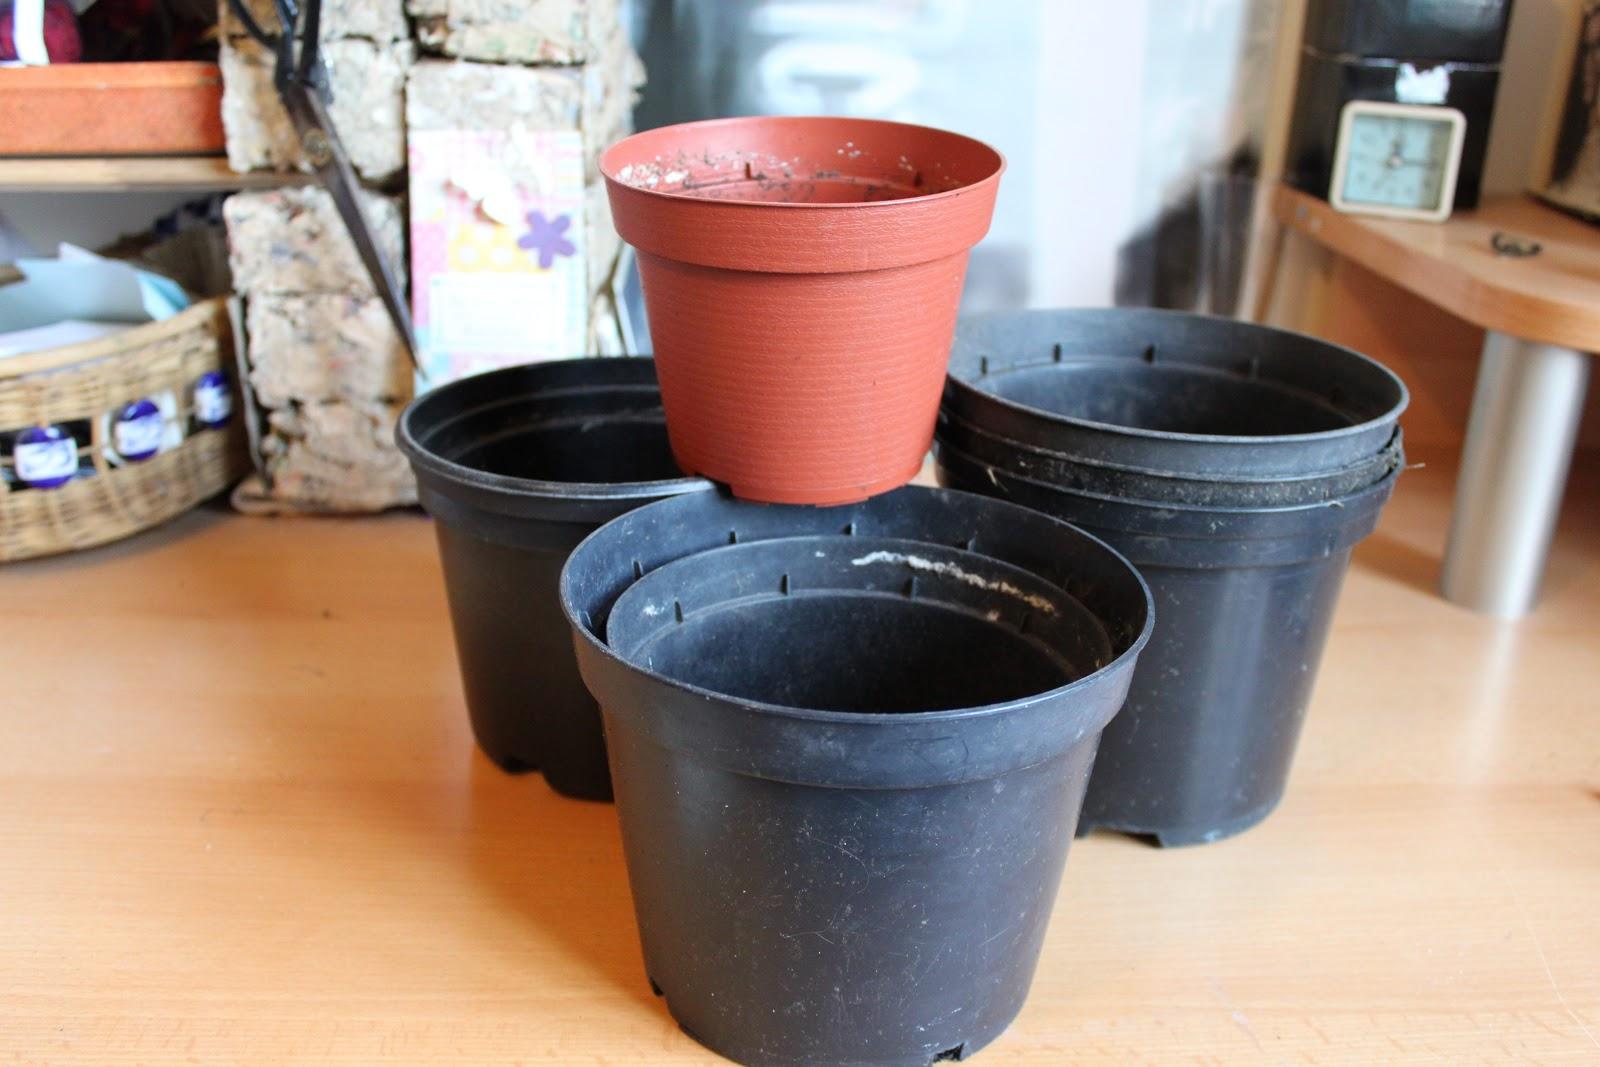 a journey to a dream: plastic plant pot revamp!